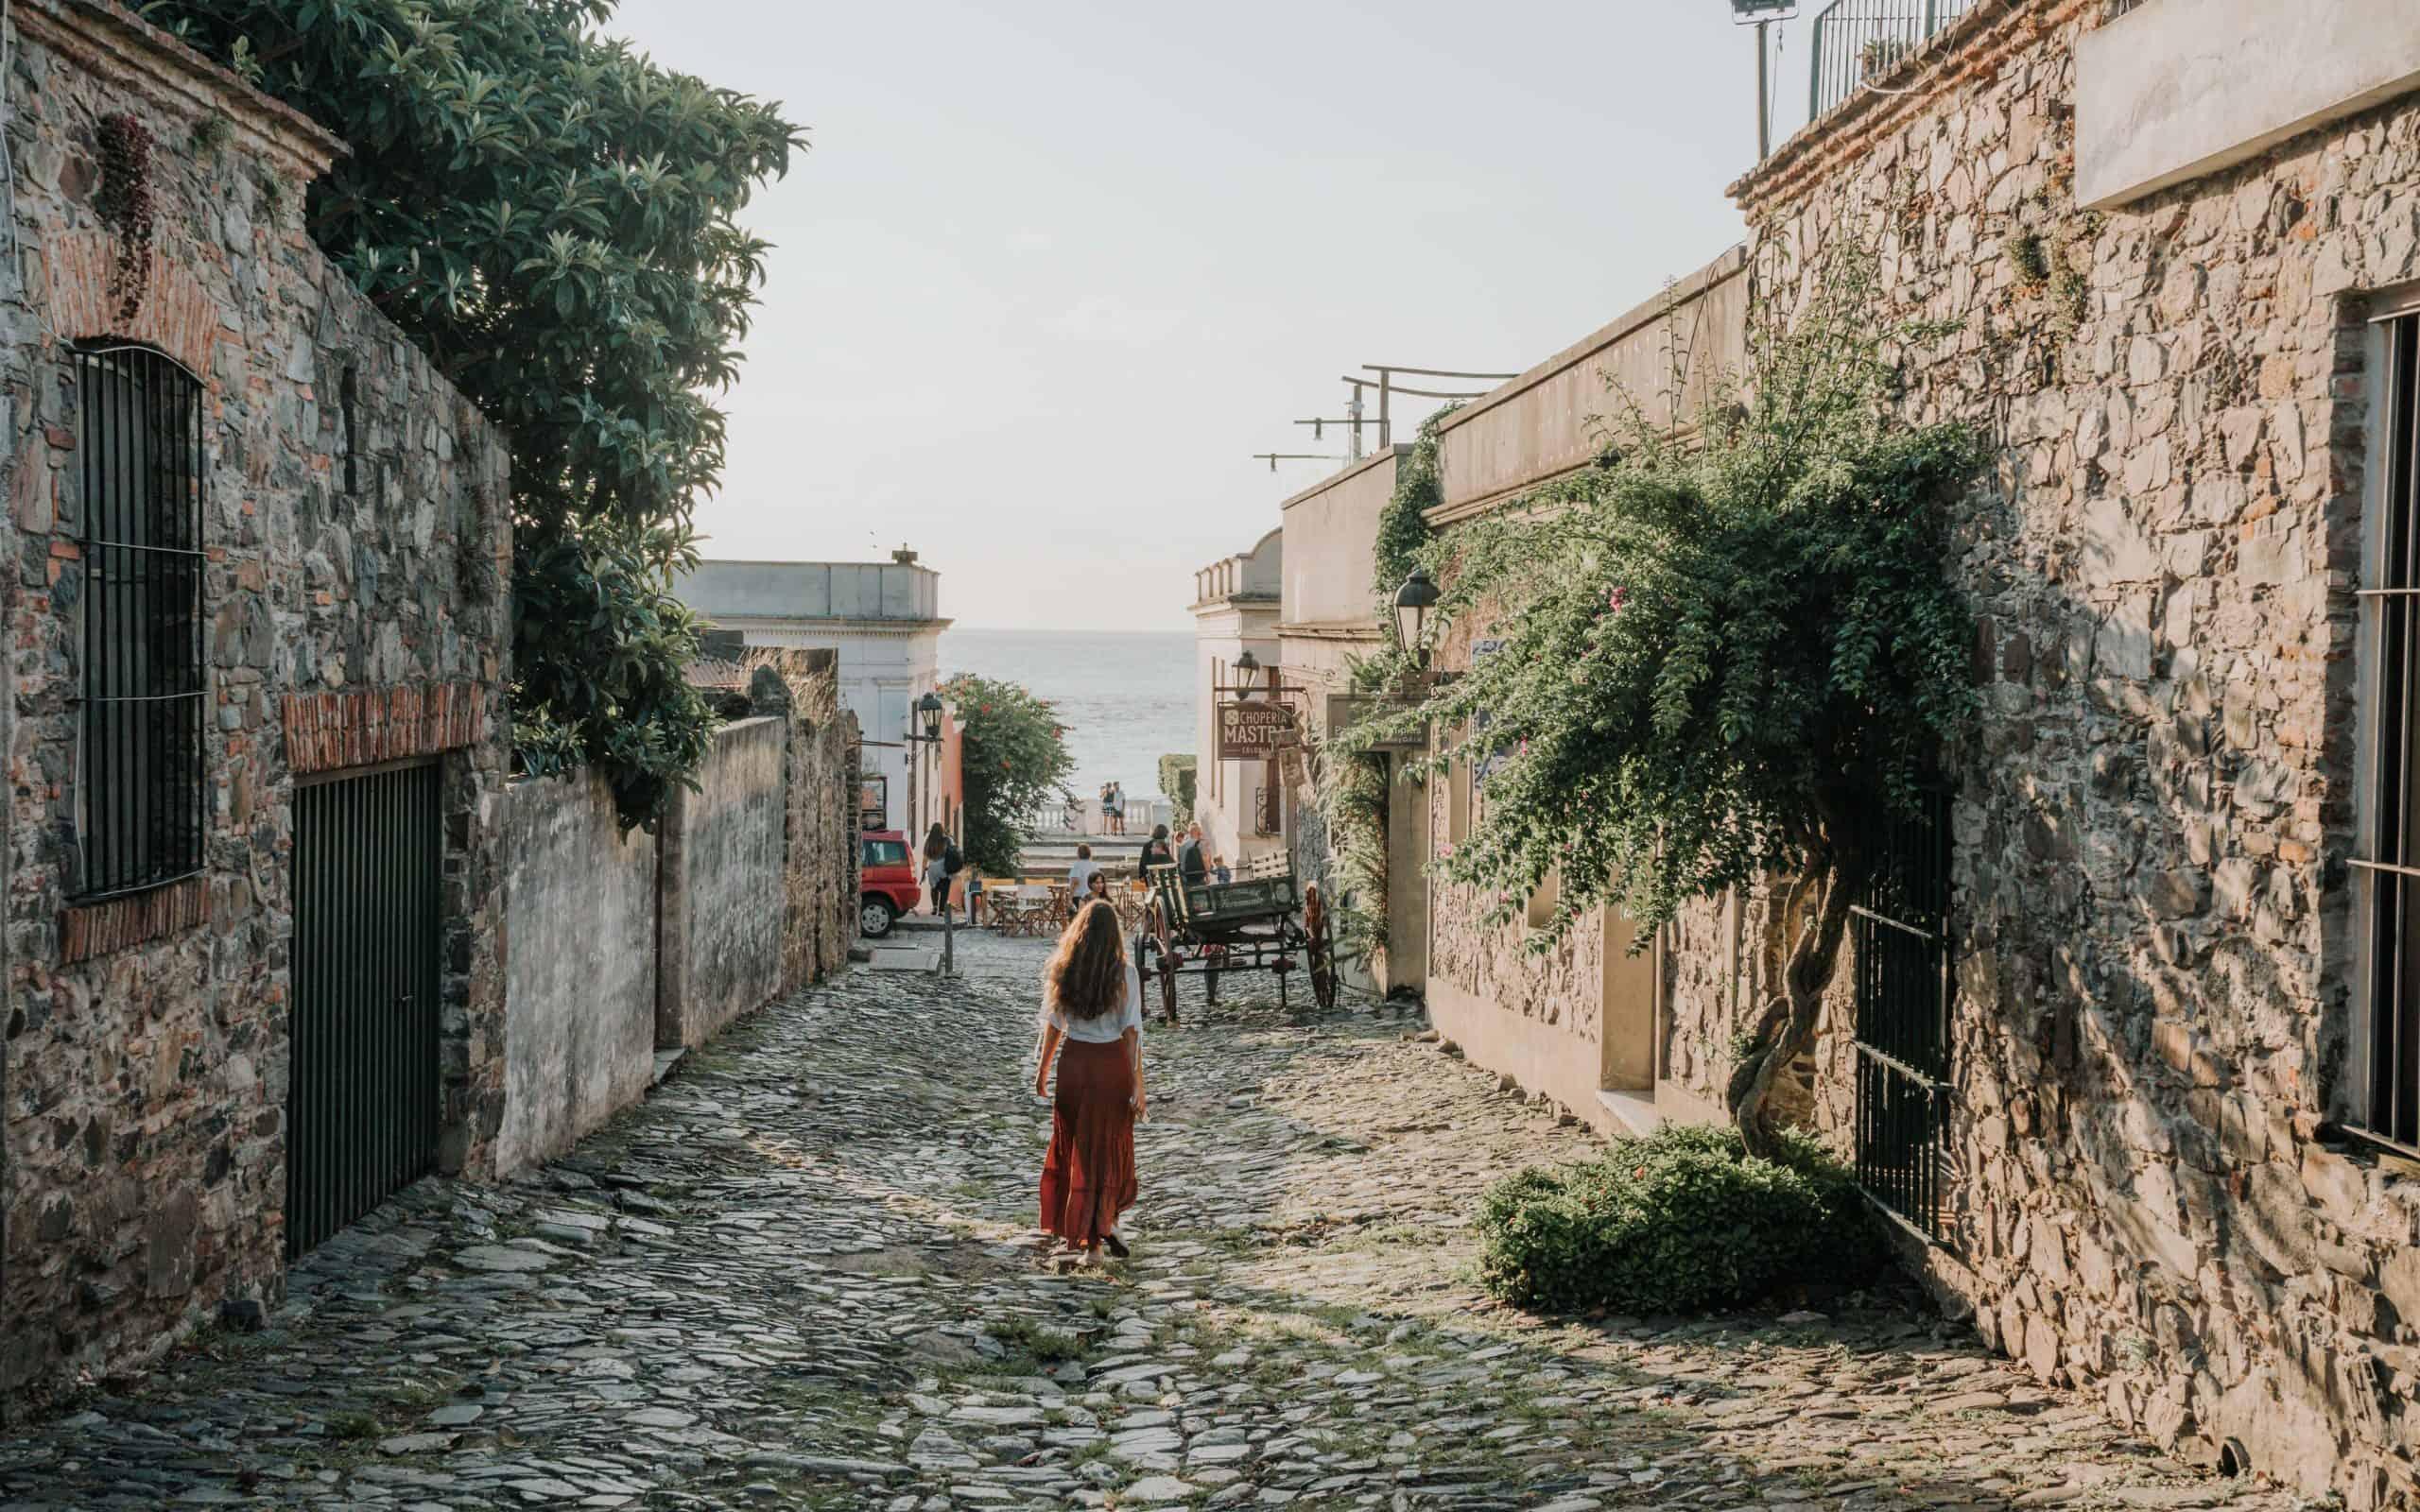 uruguay-colonia-del-sacramento-street